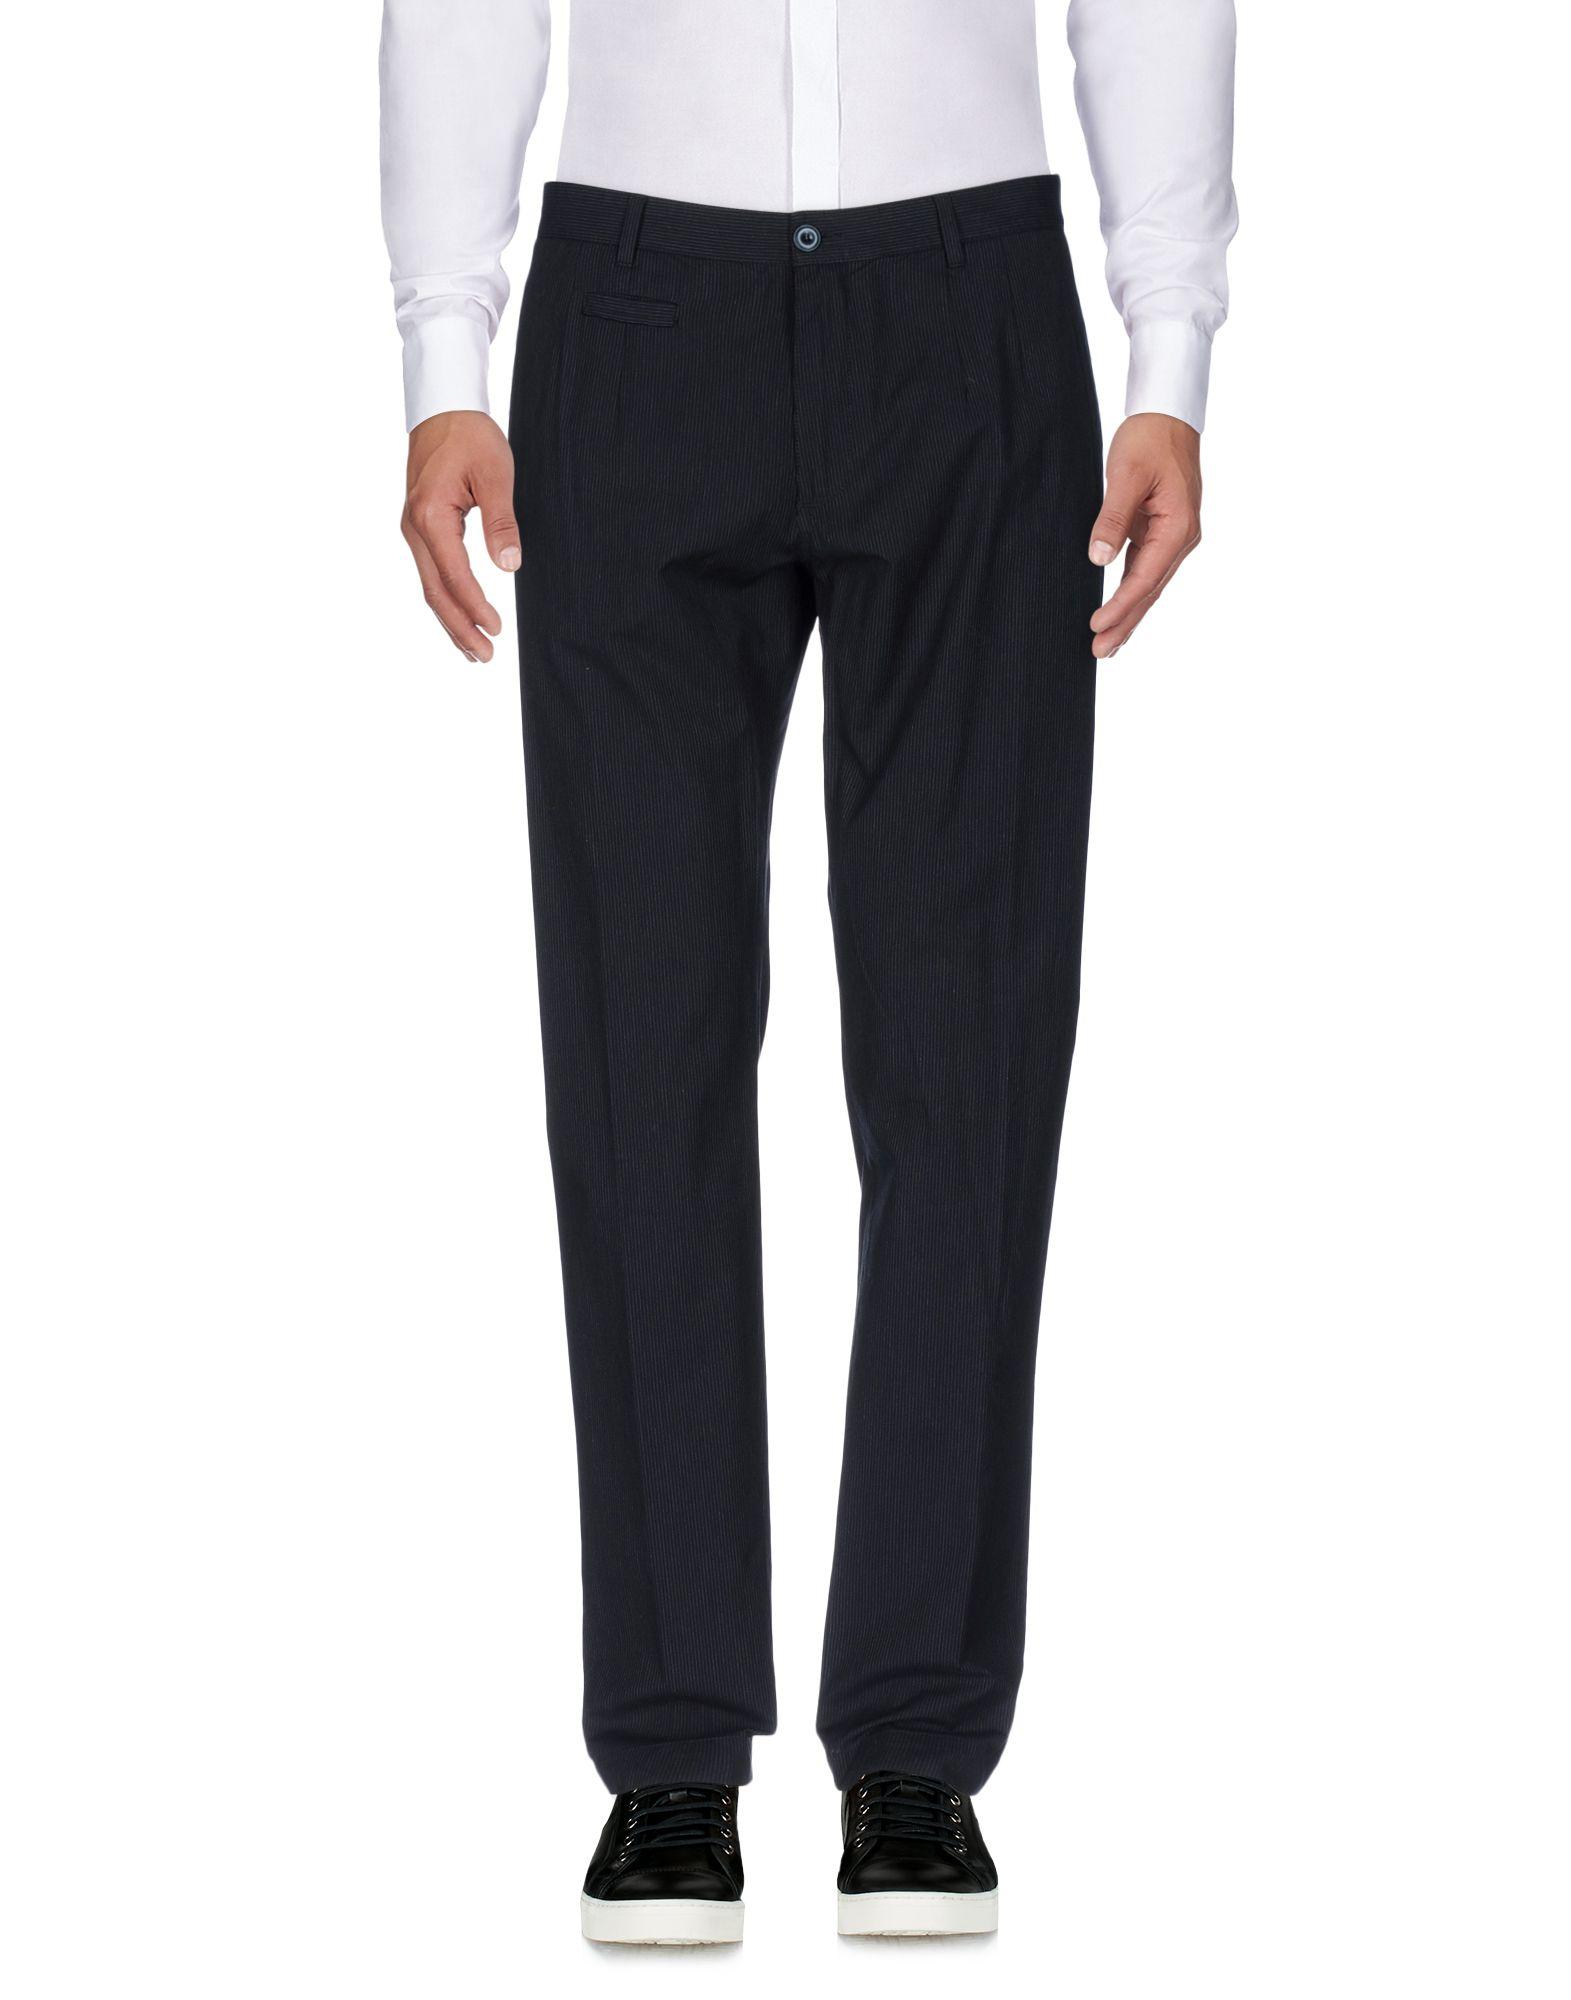 Pantalone Dolce & Gabbana Donna - Acquista online su